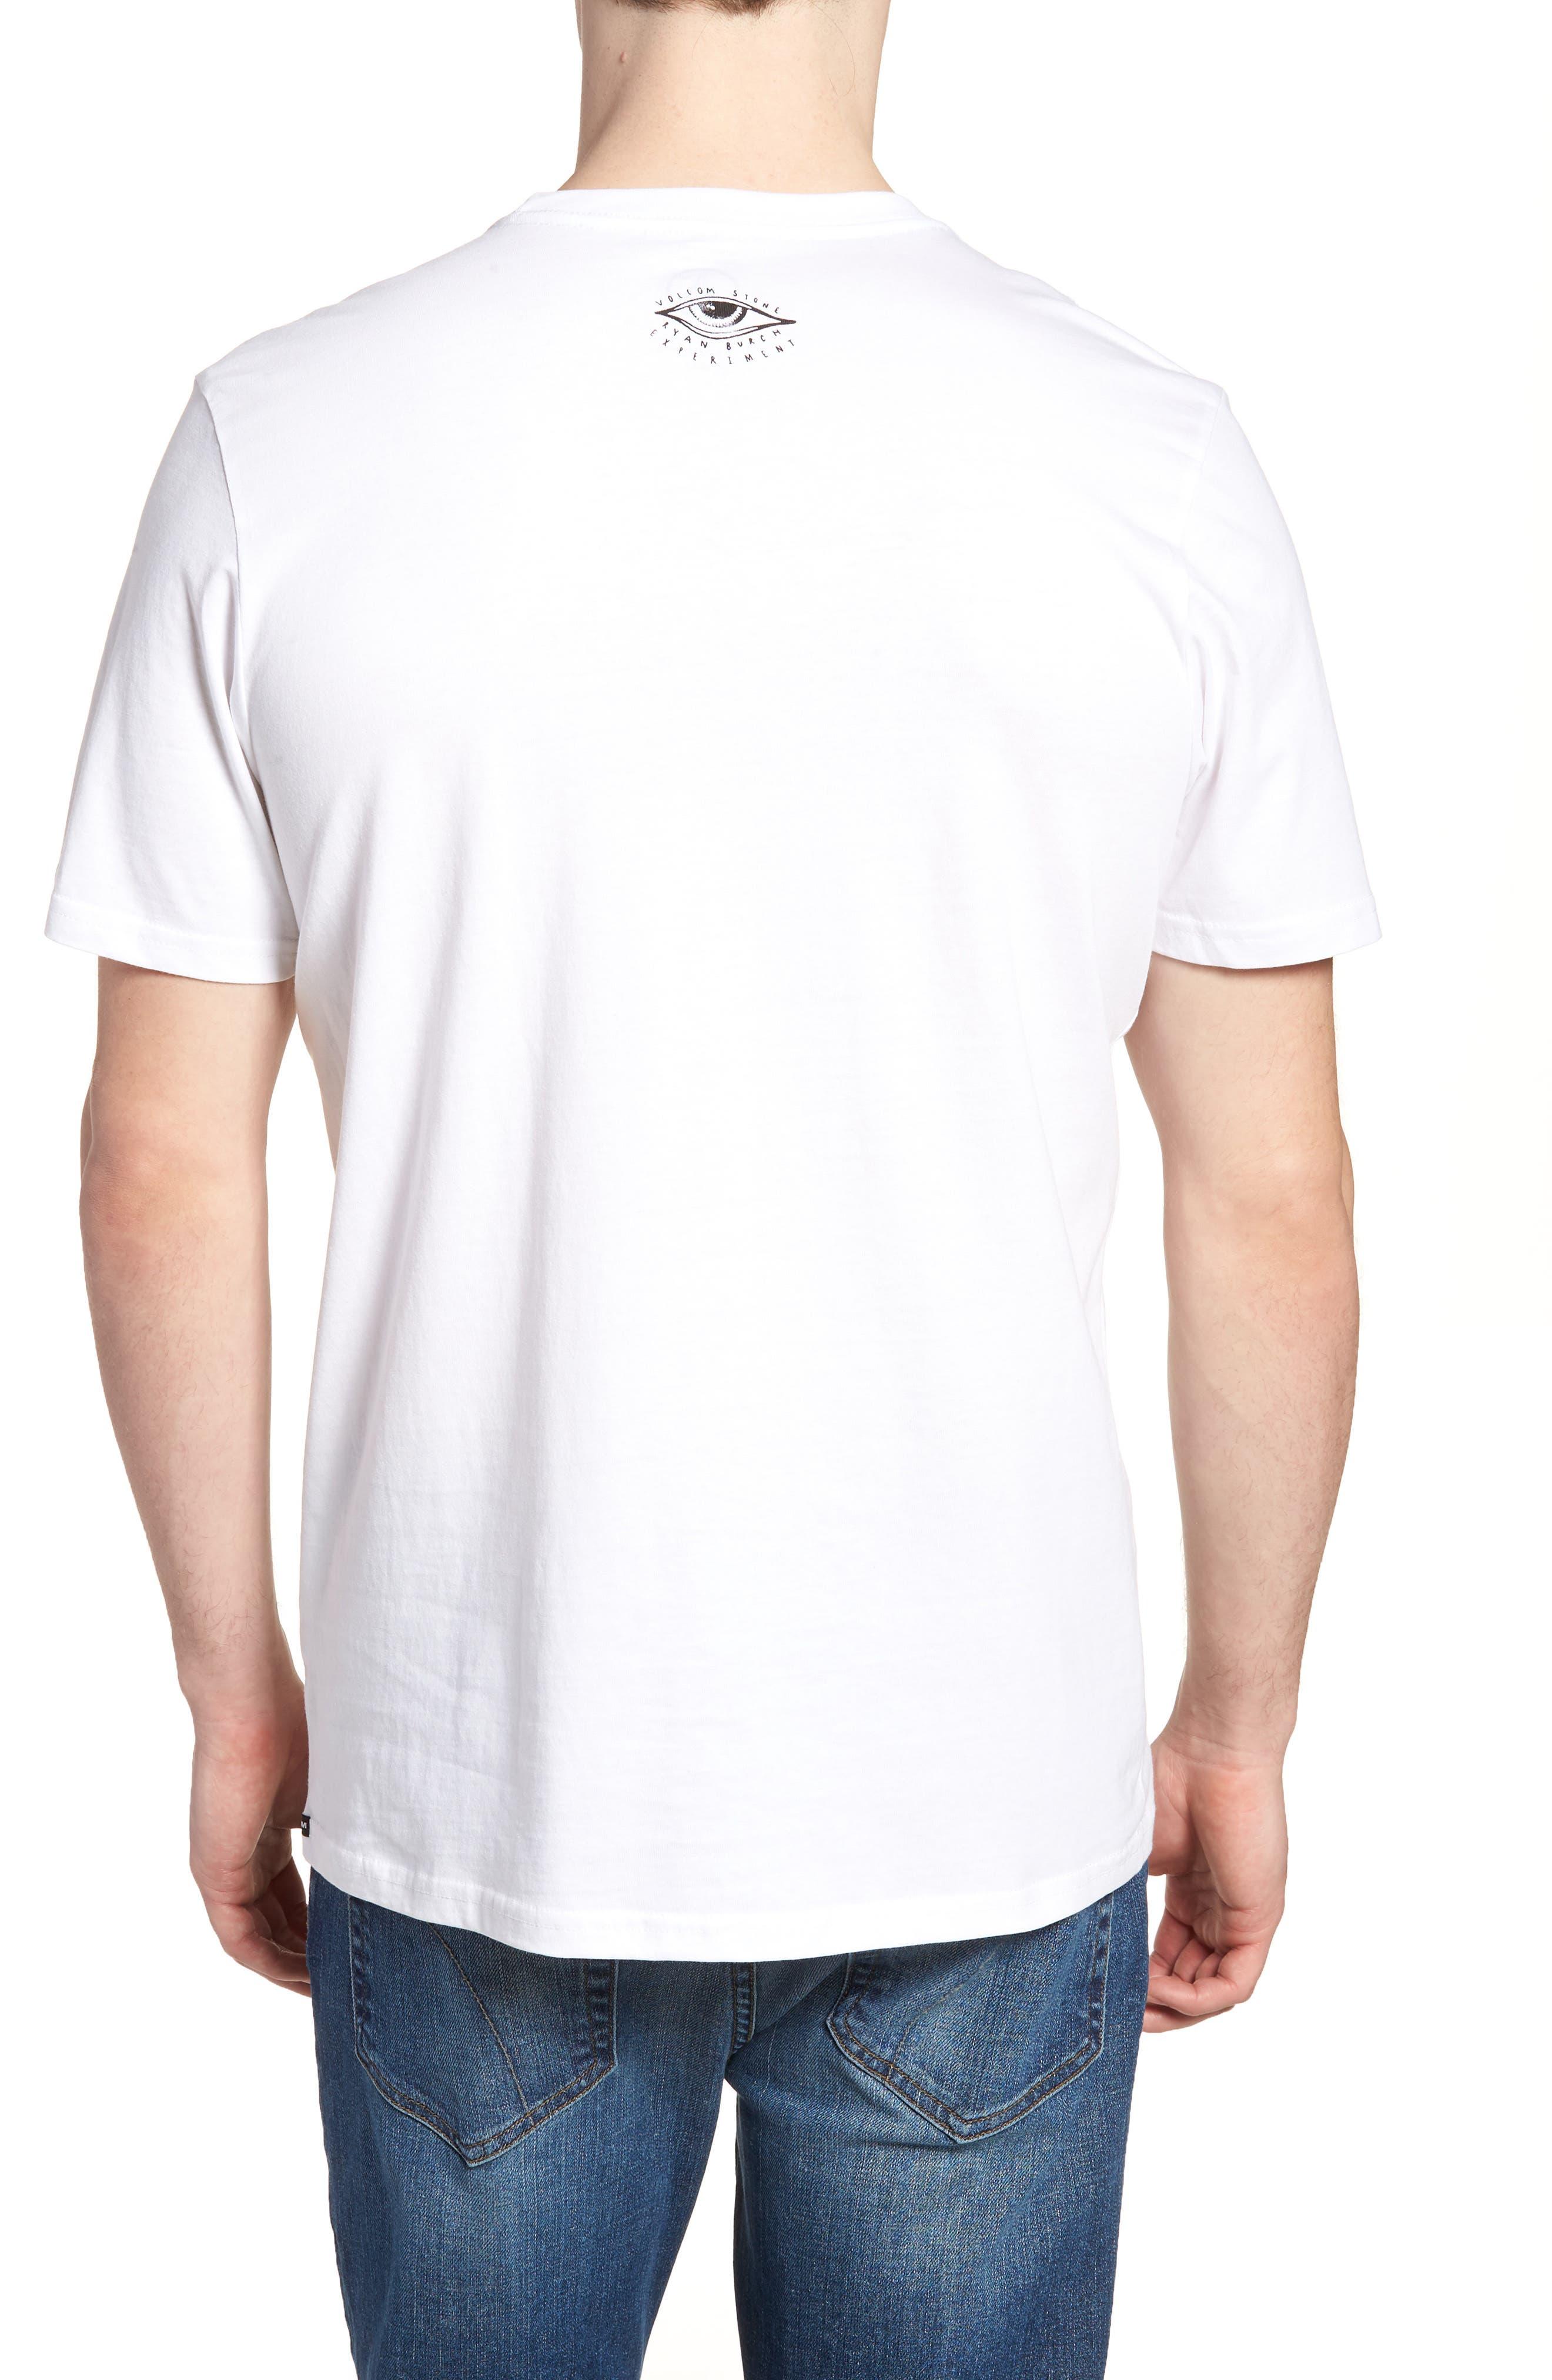 Burch Foam Graphic T-Shirt,                             Alternate thumbnail 2, color,                             White